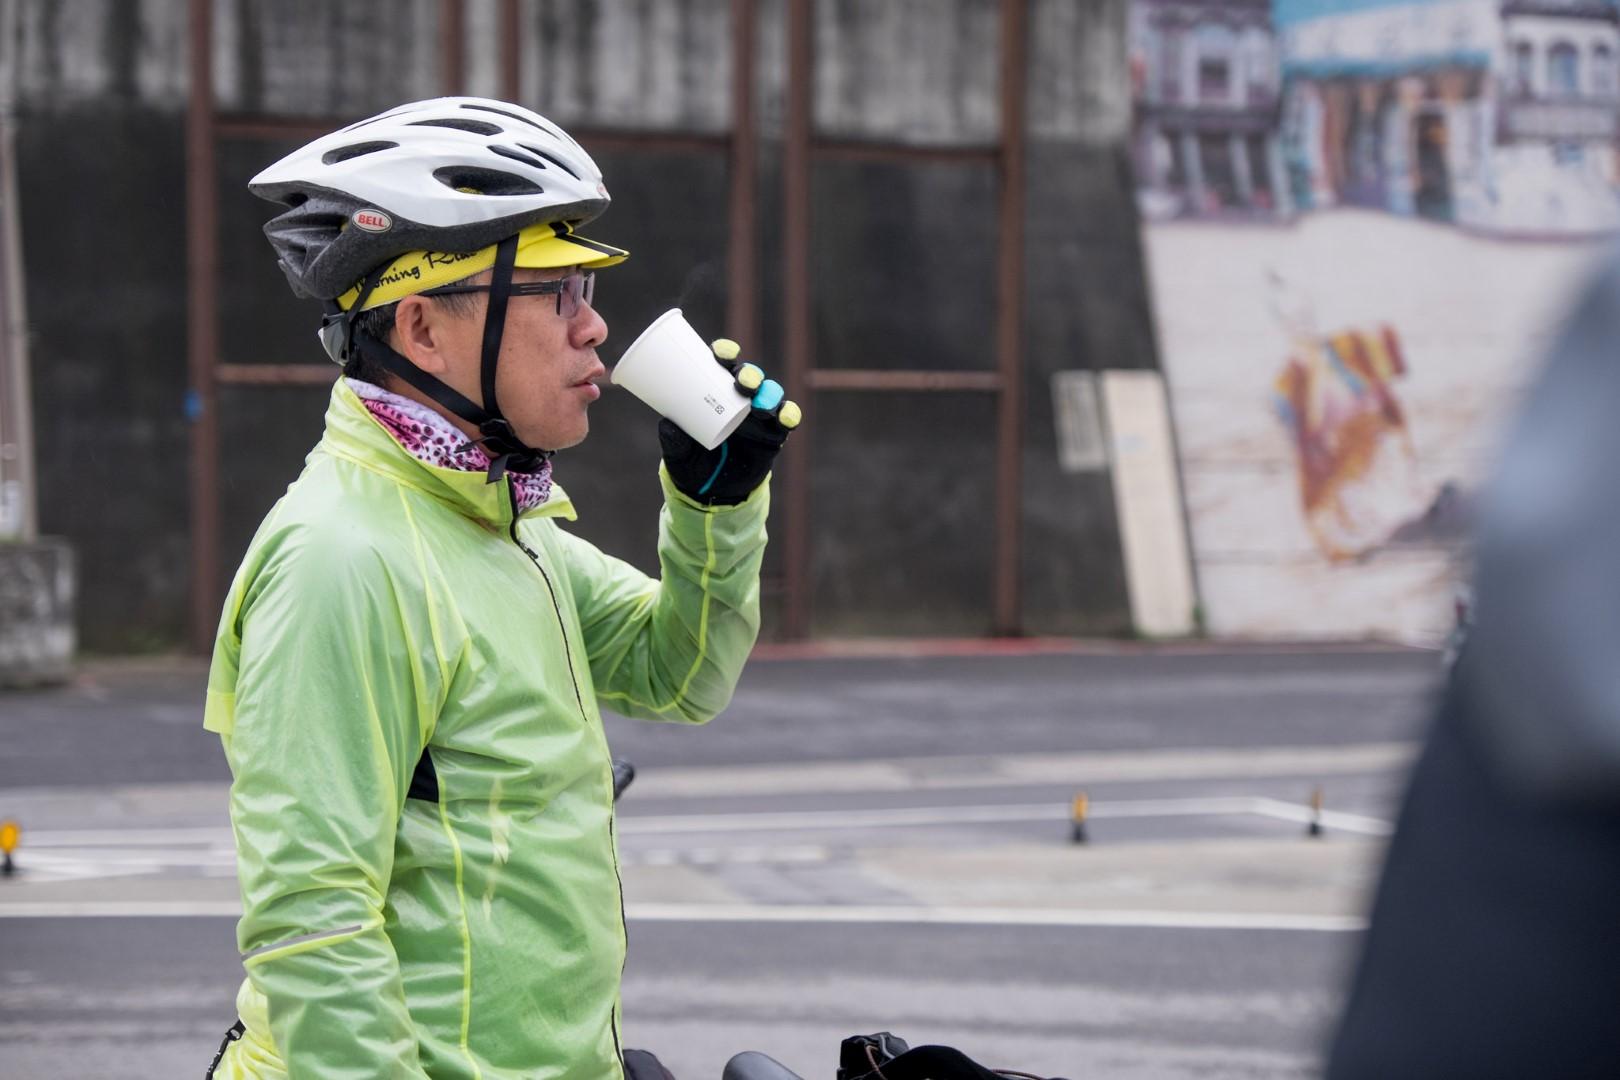 activity-bike-day-170302-3